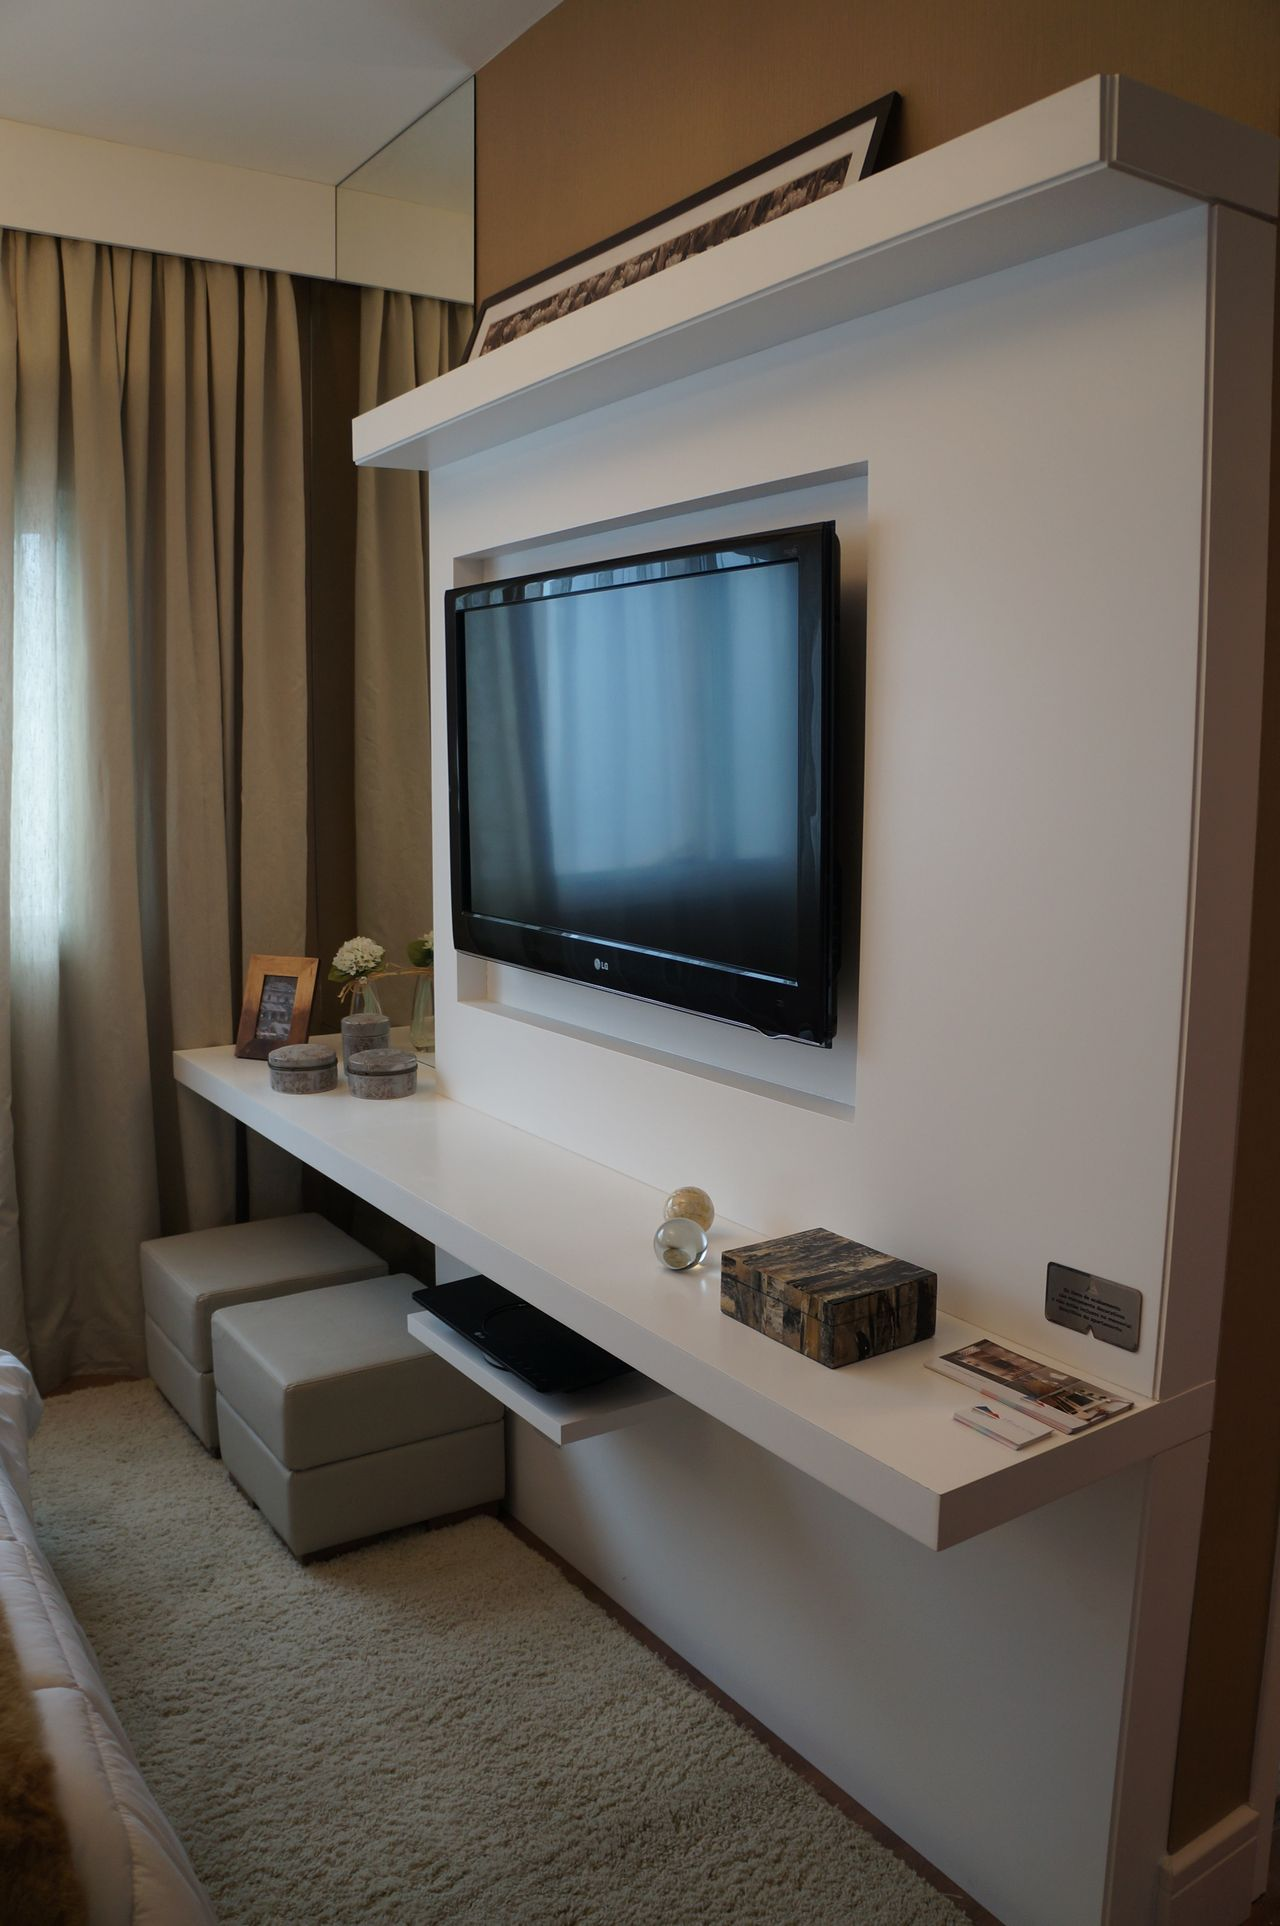 Sala De Tv Com Rack E Painel De Madeira Branco De Mauren Buest